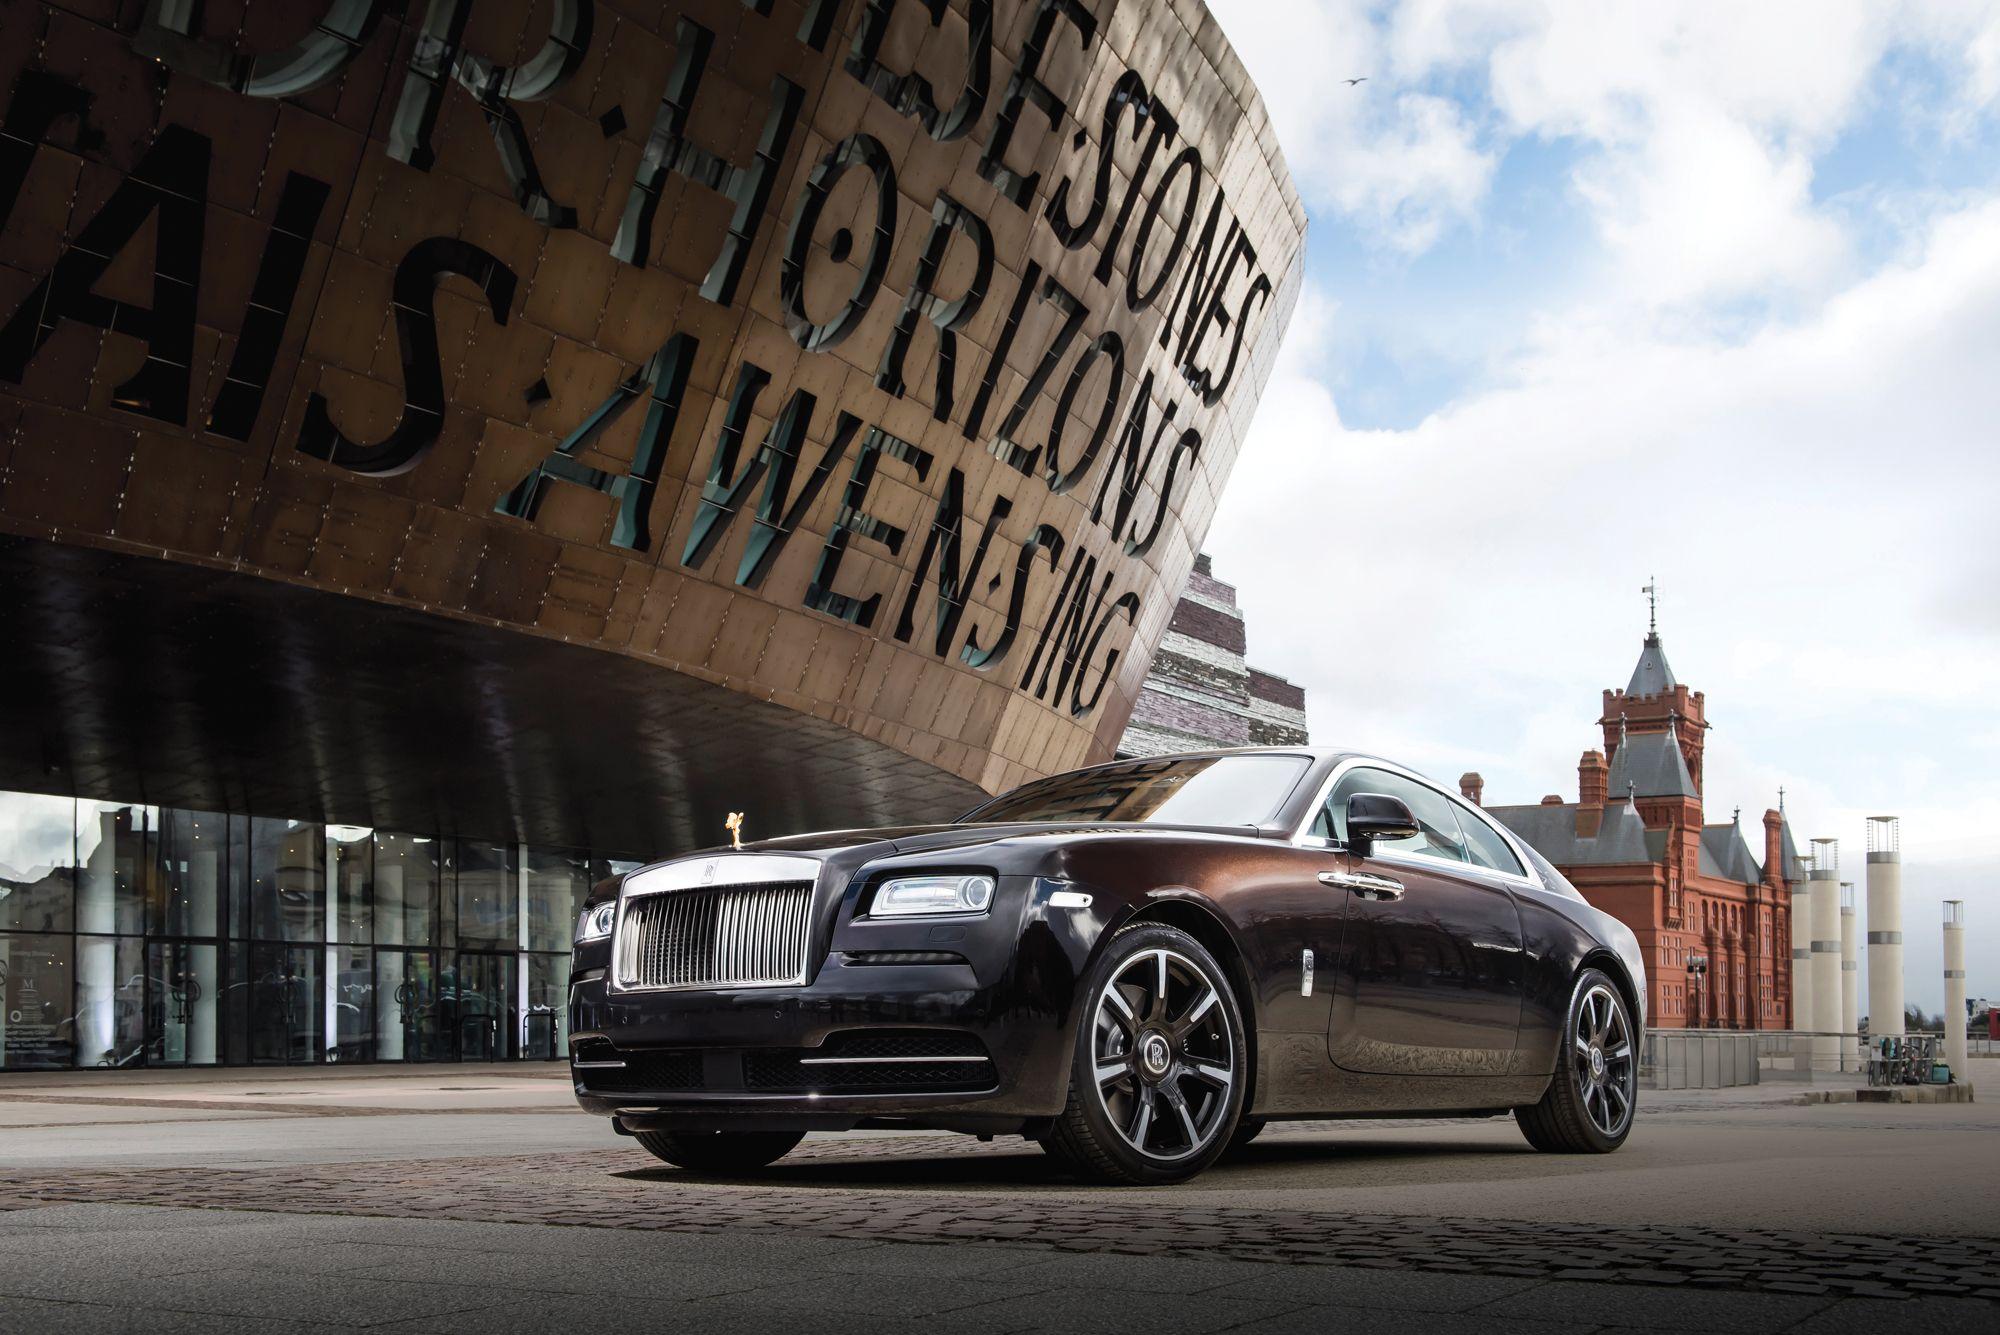 Rolls-Royce Wraith Inspired by British MusicPhoto: James Lipman / jameslipman.com